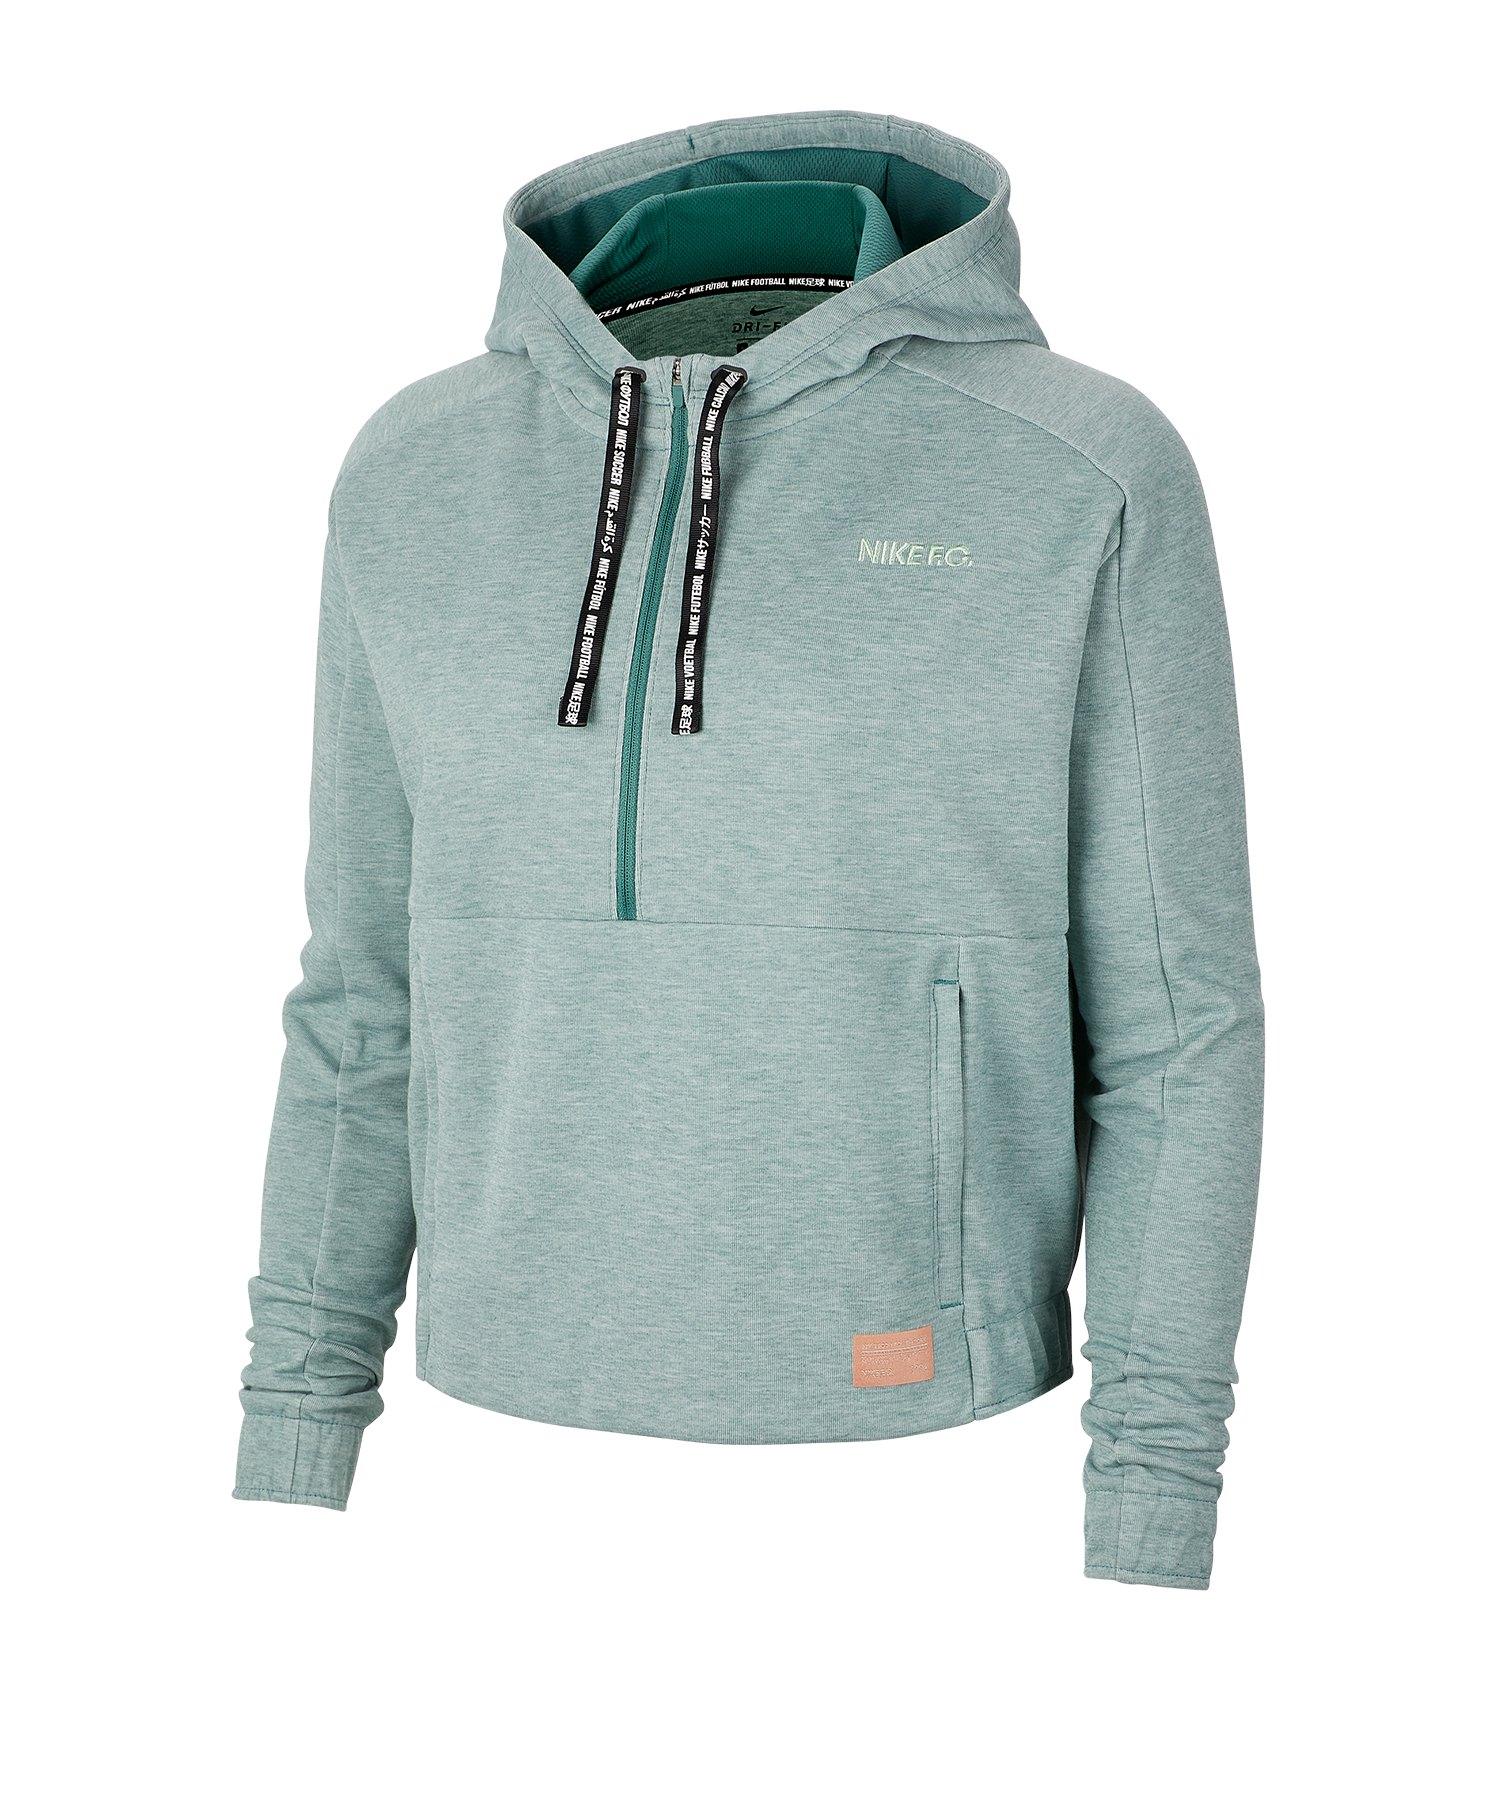 Nike F.C. Hoody 1/2 Kapuzensweatshirt Damen F362 - gruen